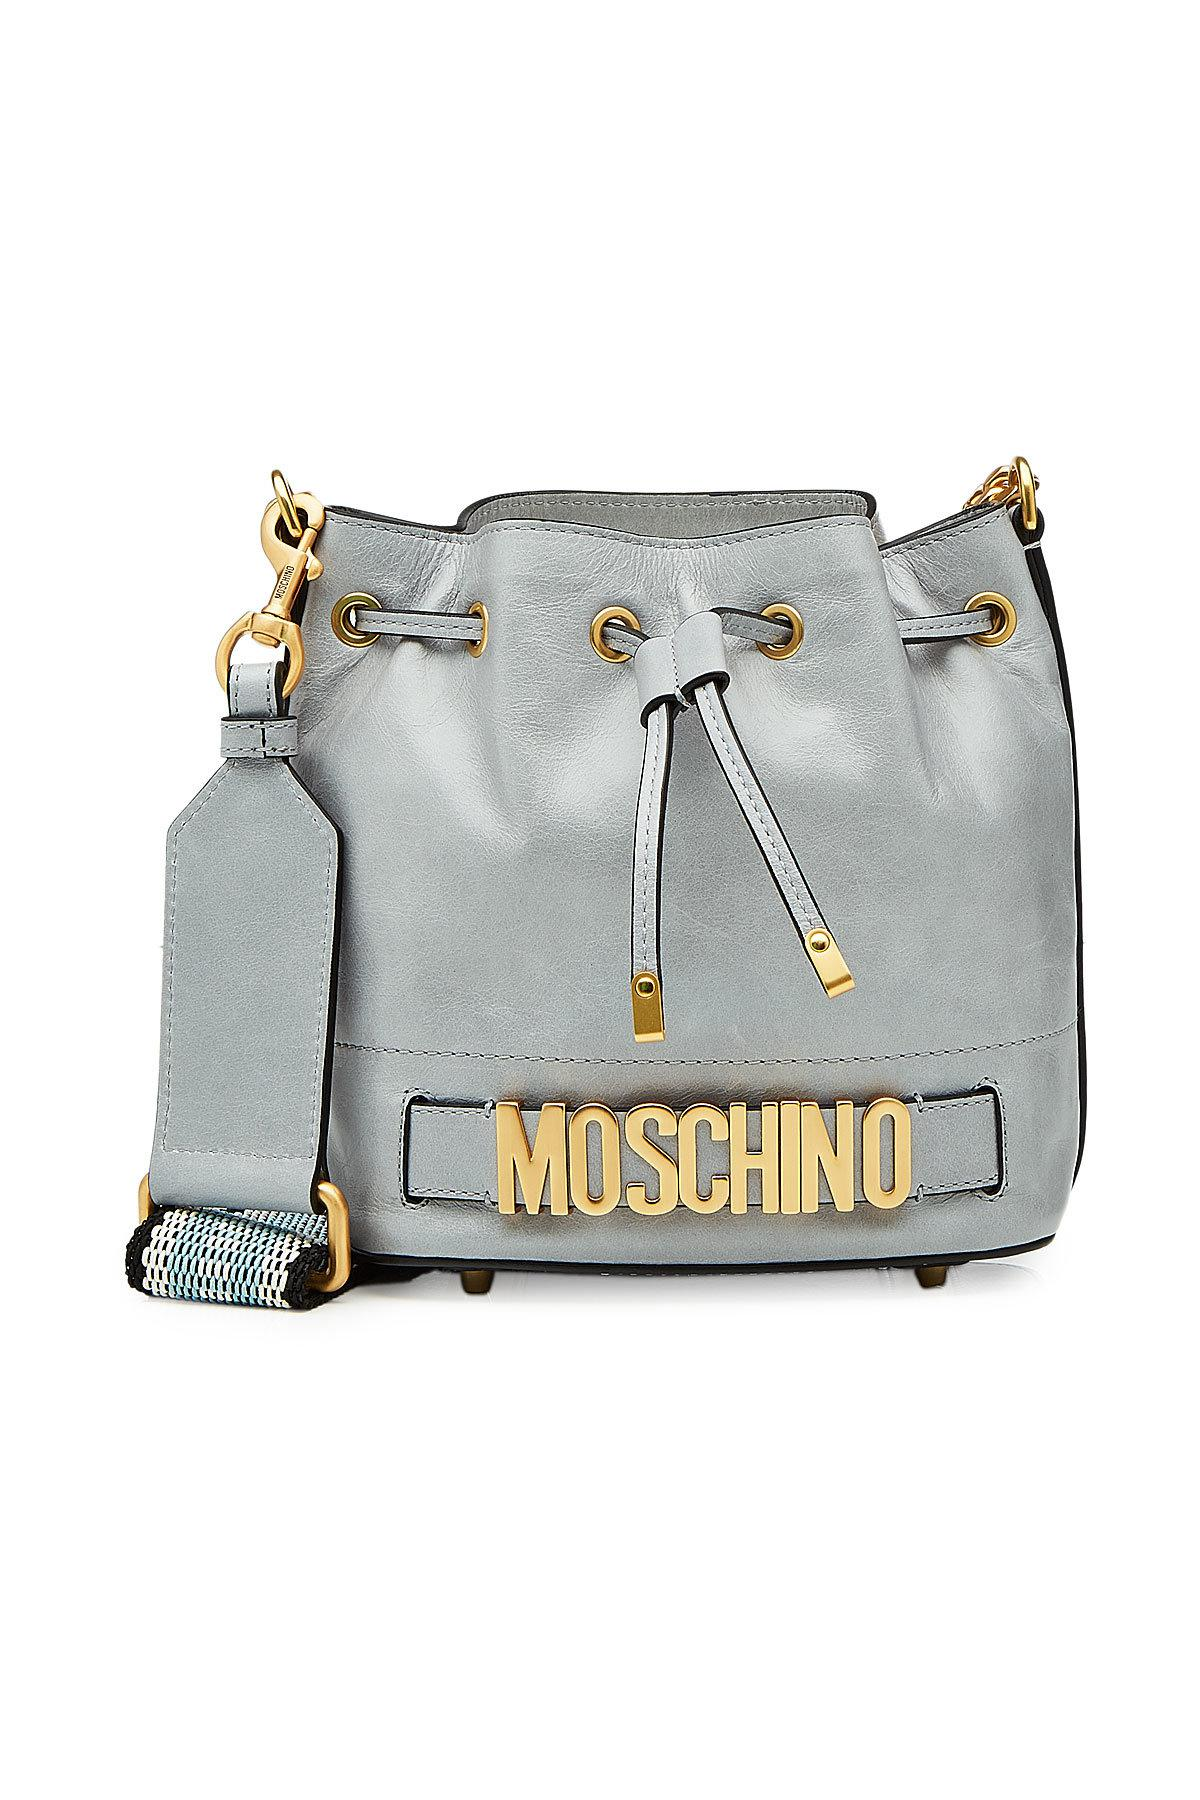 Lyst - Sac seau en cuir à logo Moschino 88a576dbb11